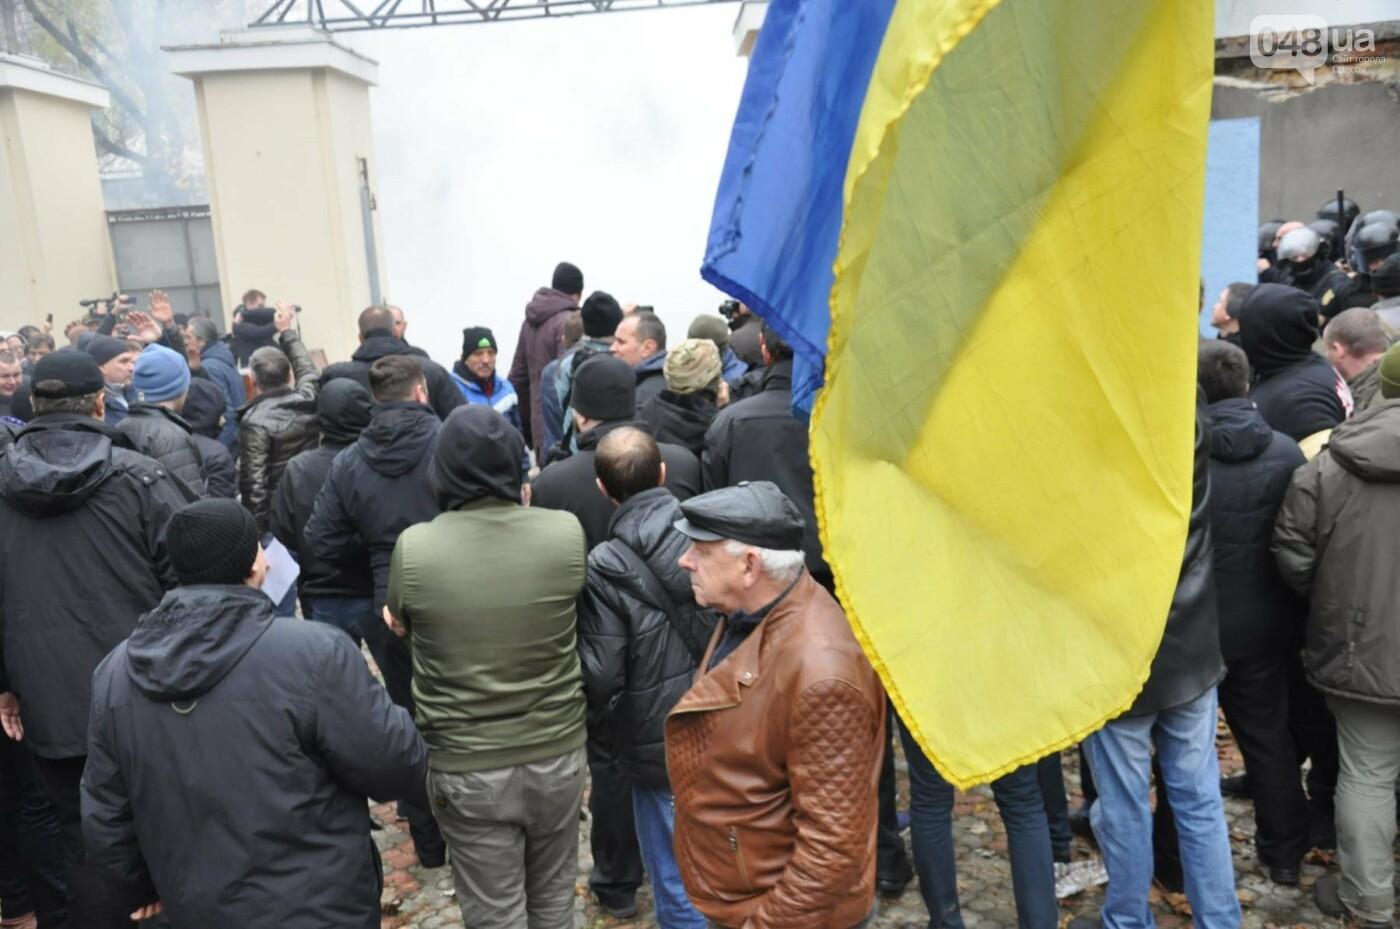 Около 5 сотен одесситов протестовали против застройки Горсада (ФОТО) , фото-4